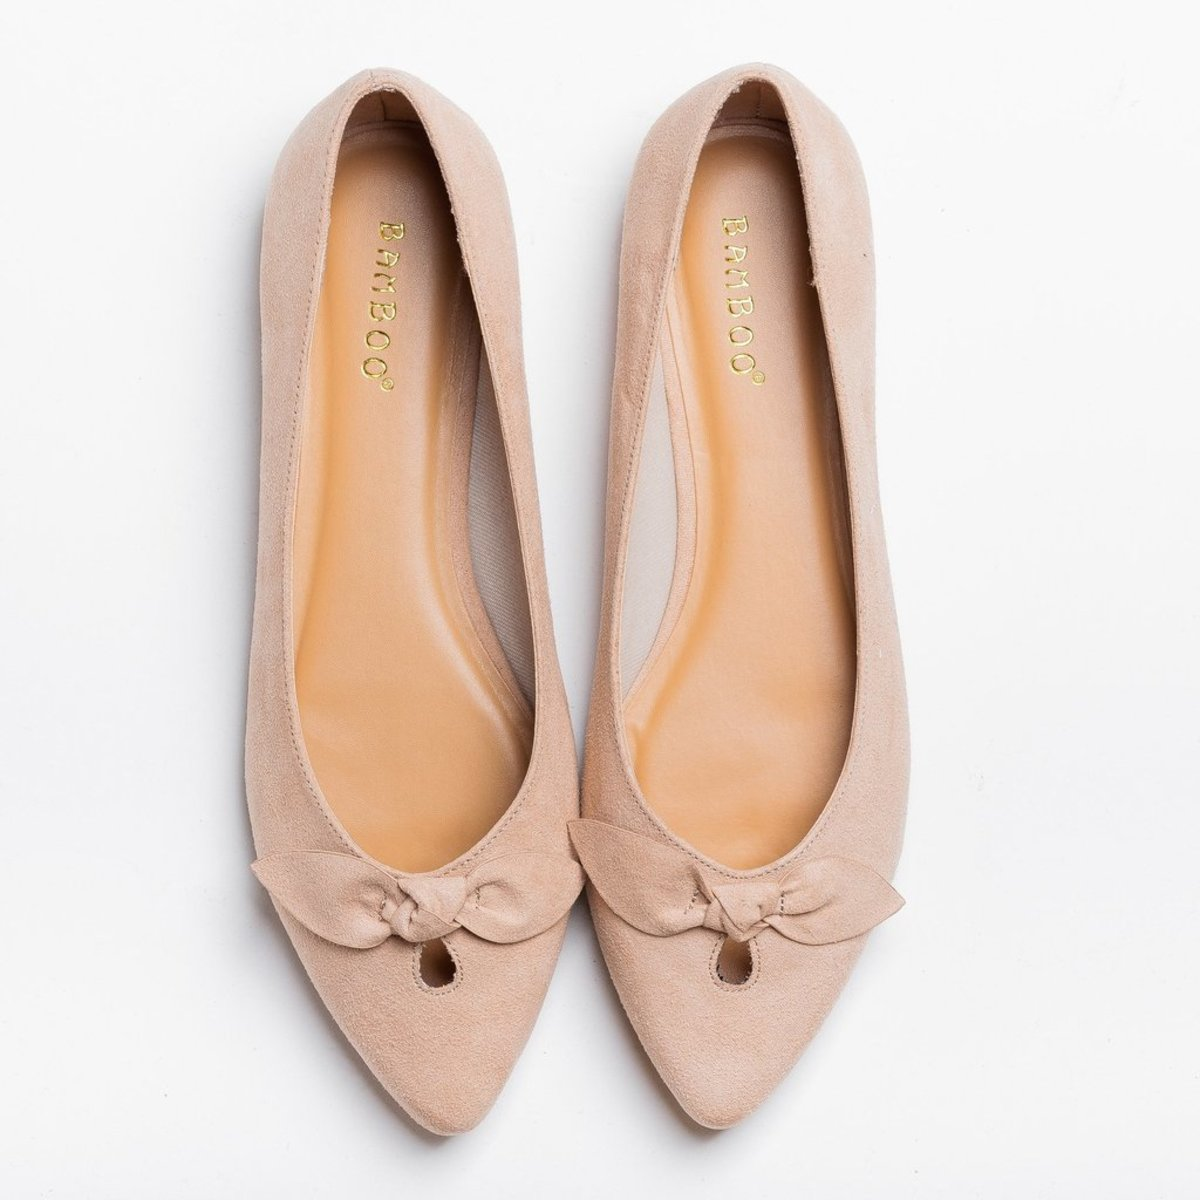 shoes_petite_women